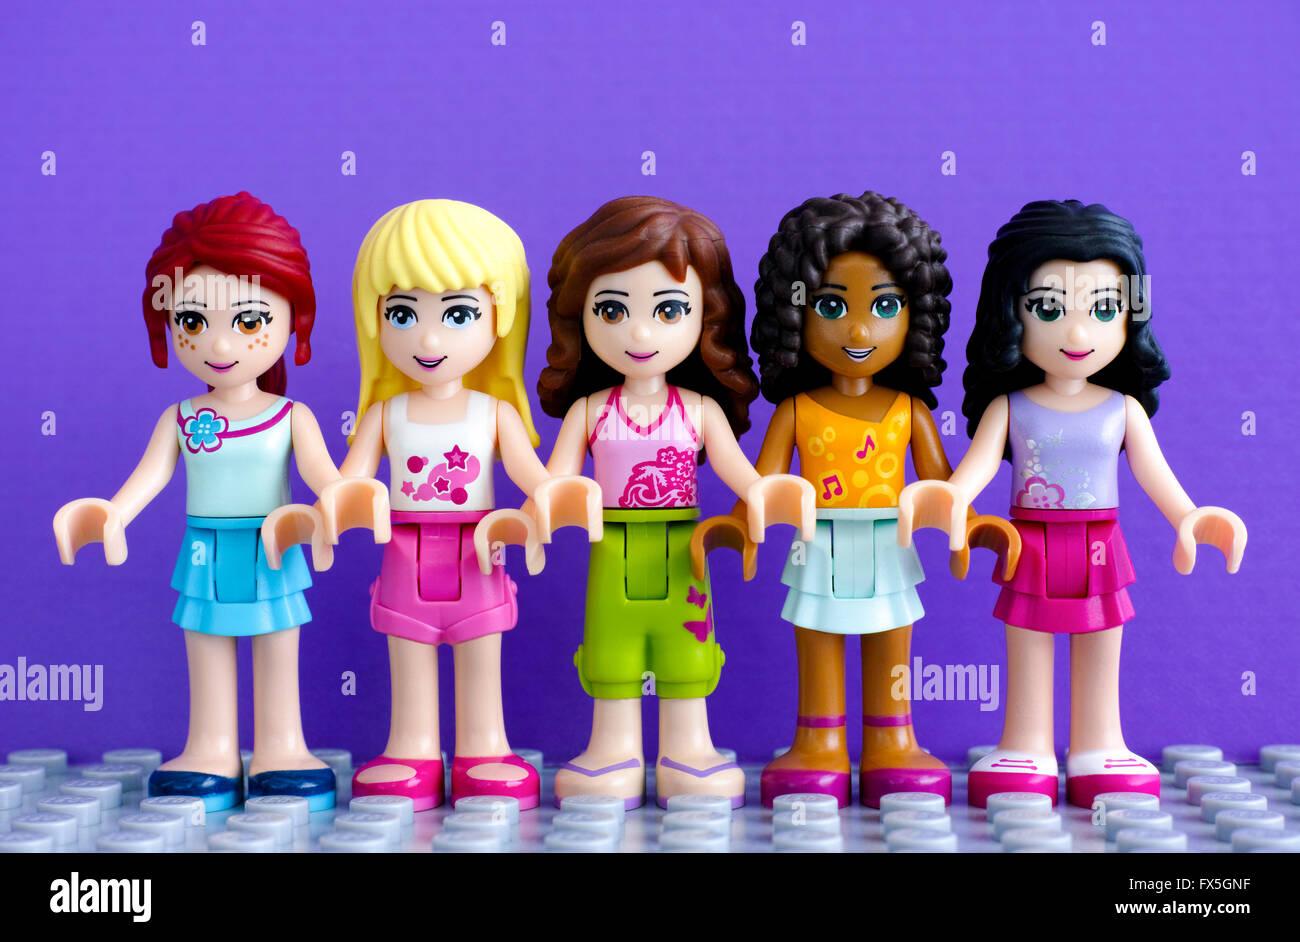 Tambov Russian Federation April 01 2016 Lego Friends Girl Stock